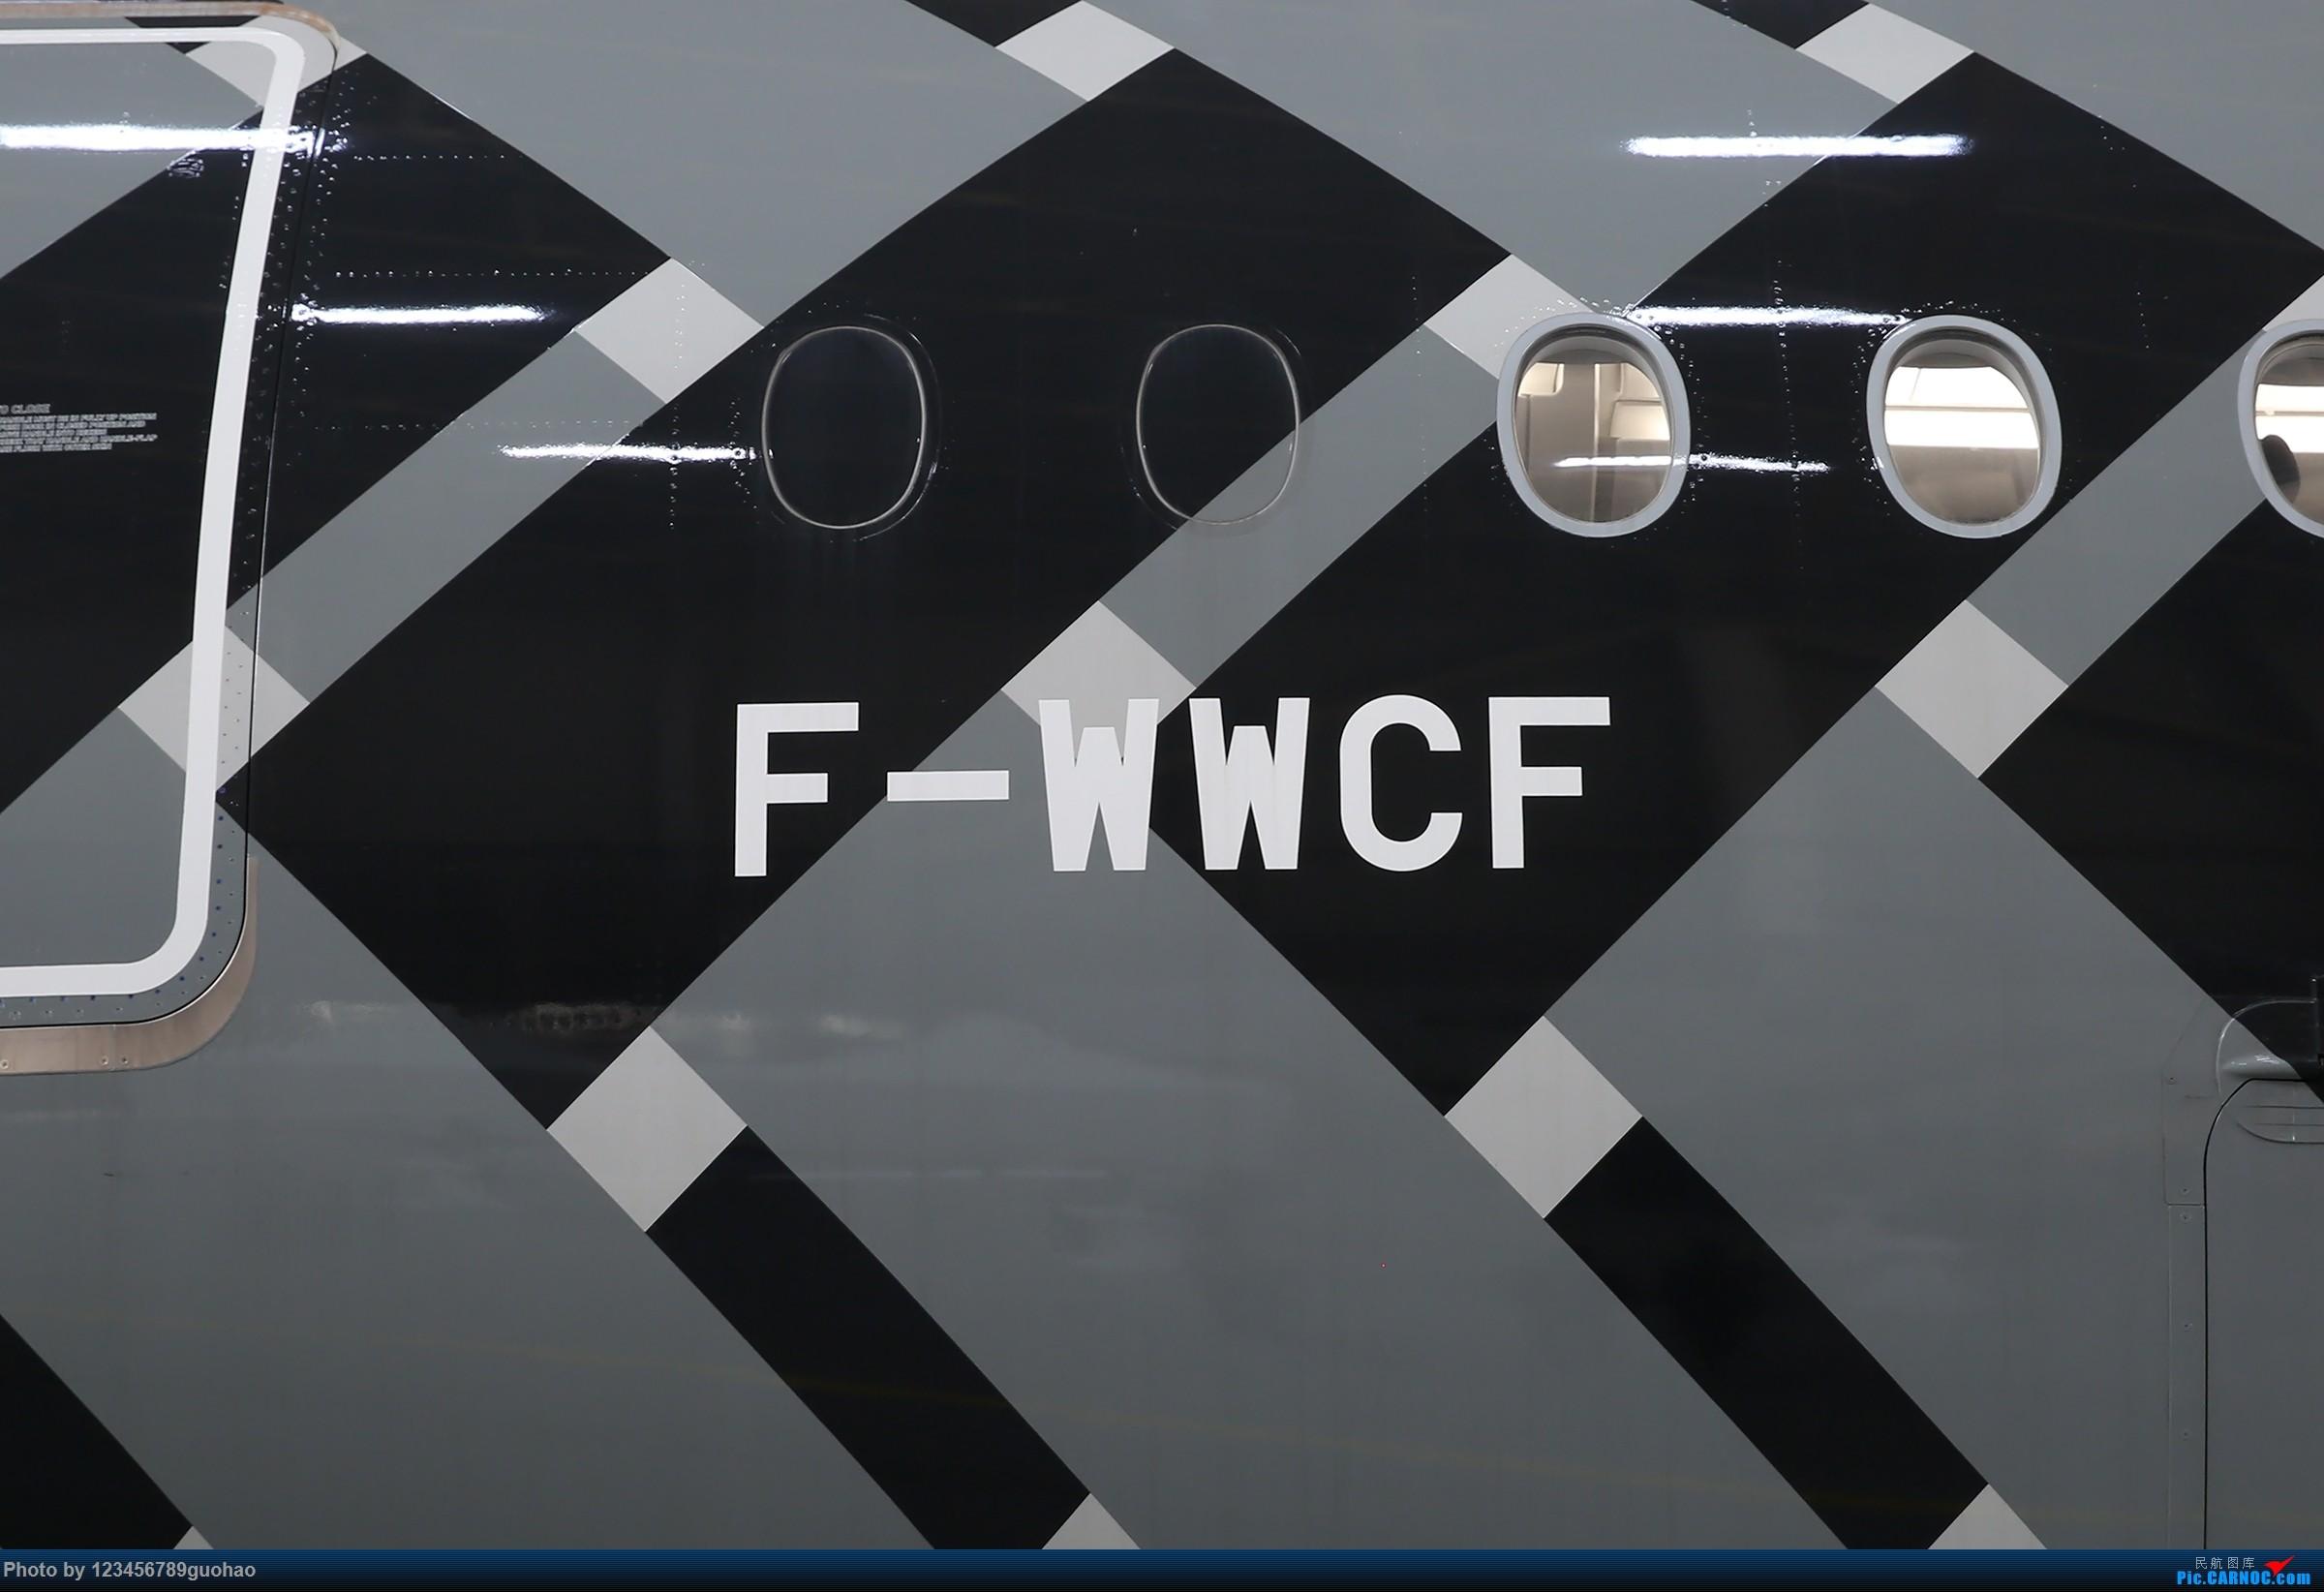 Re:[原创]F-WWCF AIRBUS A350-900 F-WWCF 北京首都国际机场